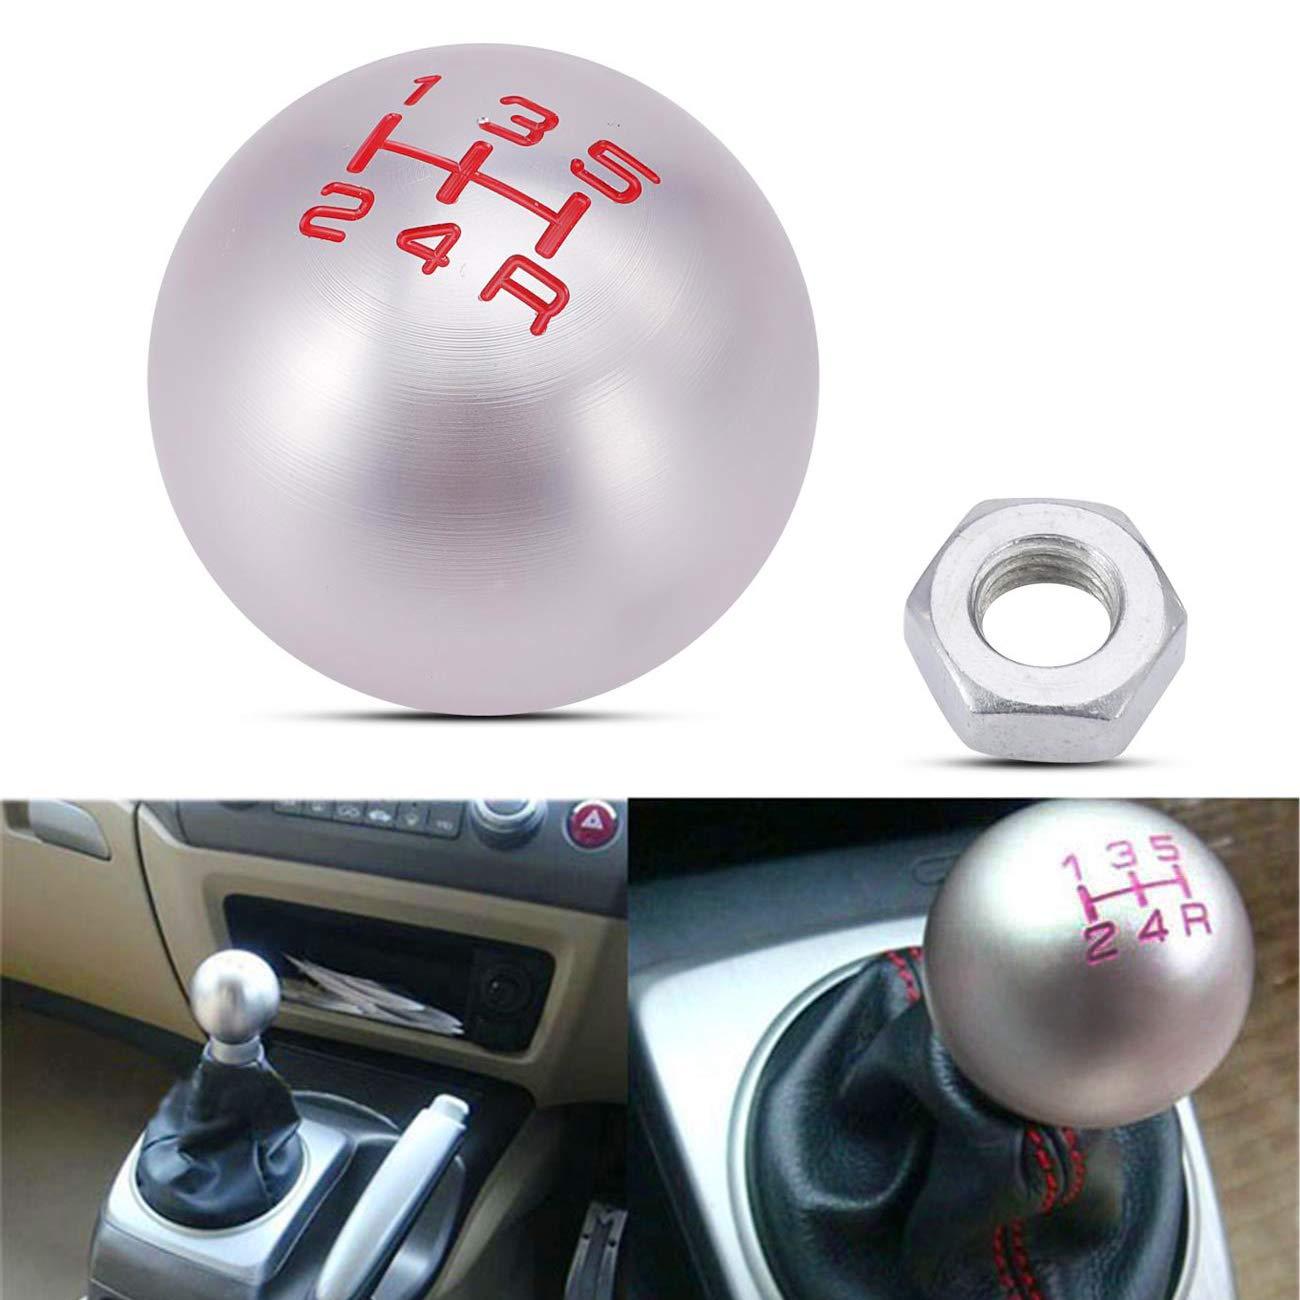 Partol 5 Speed Gear Shift Knob Manual Transmission JDM Round Ball Fit Most Honda Acura Car